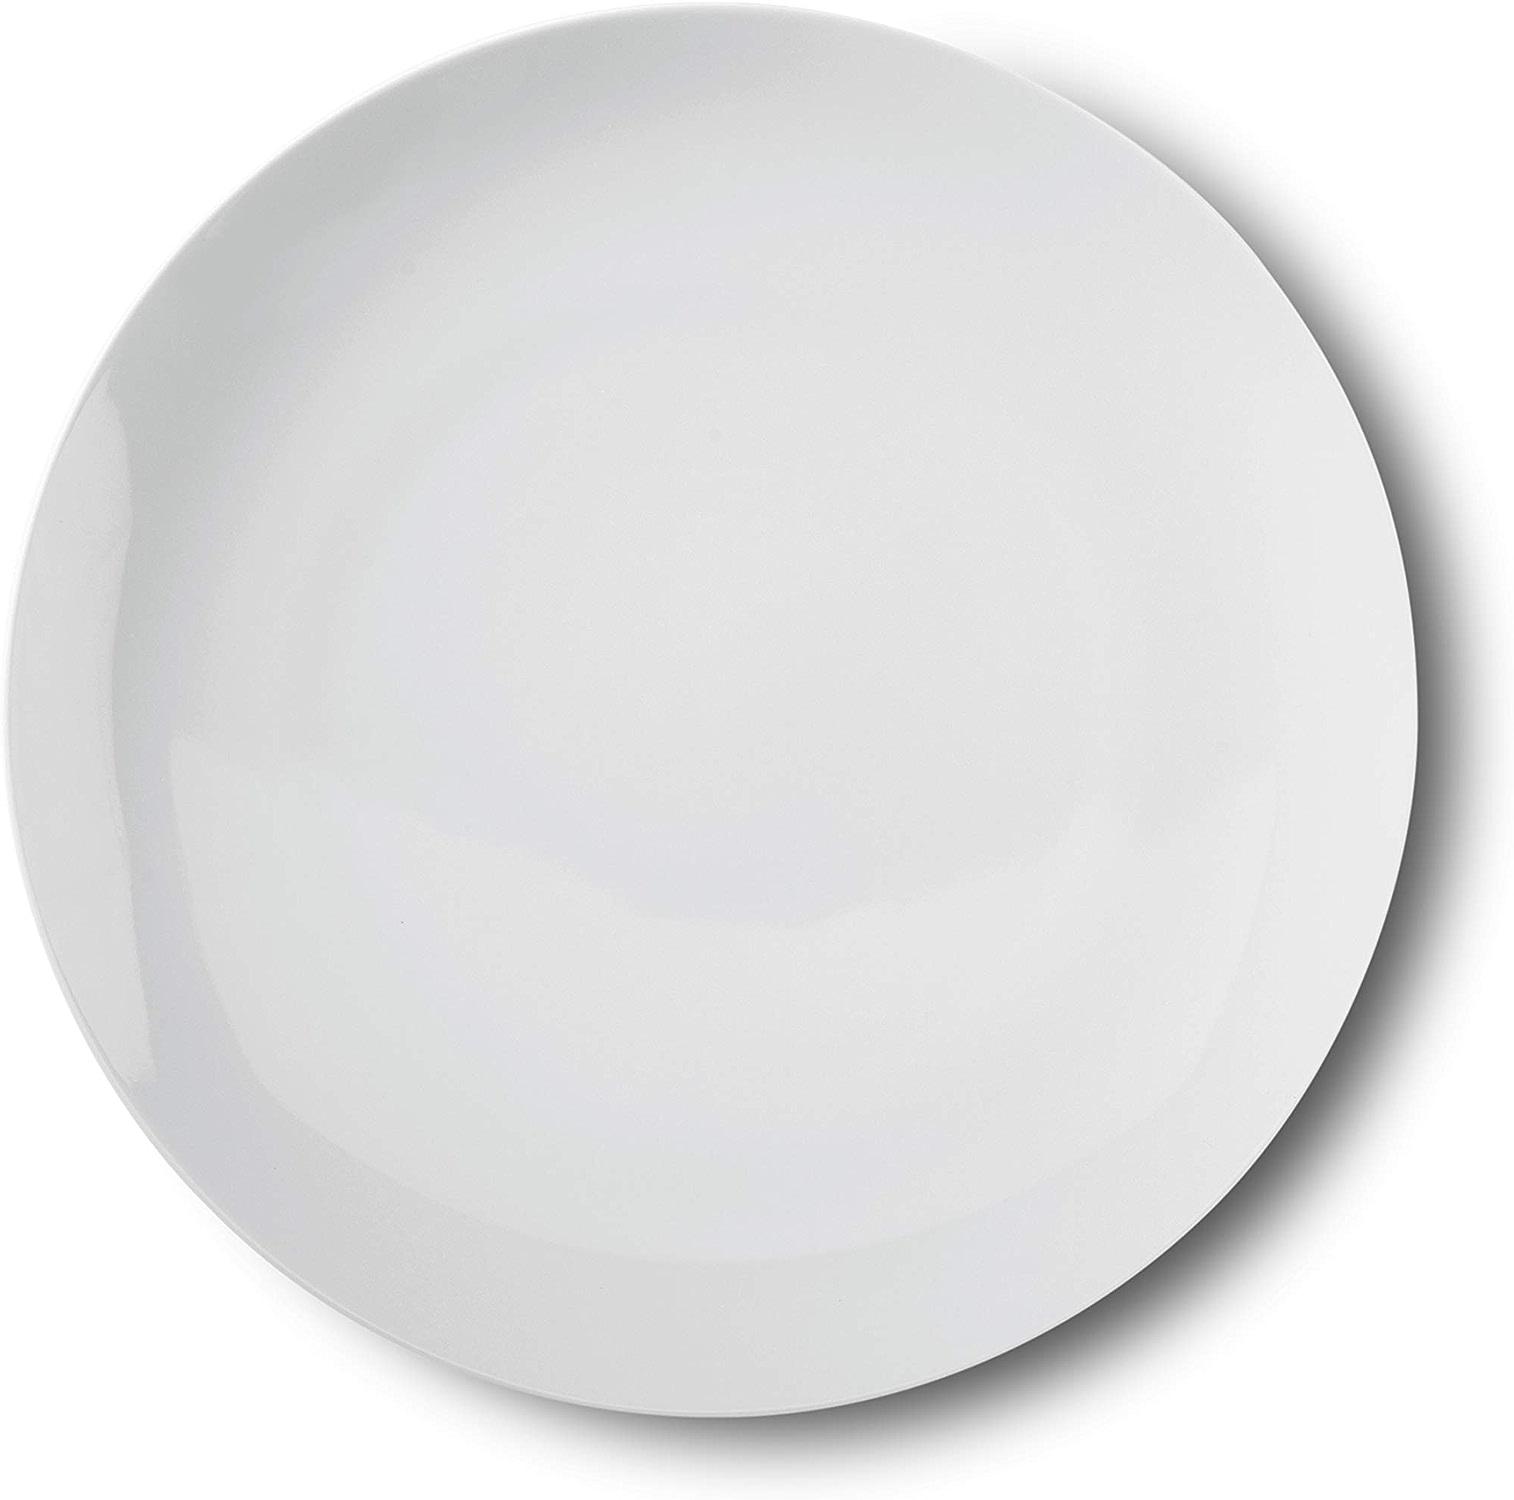 KPM 16012600 URBINO Assiette de Présentation Berlin Blanc